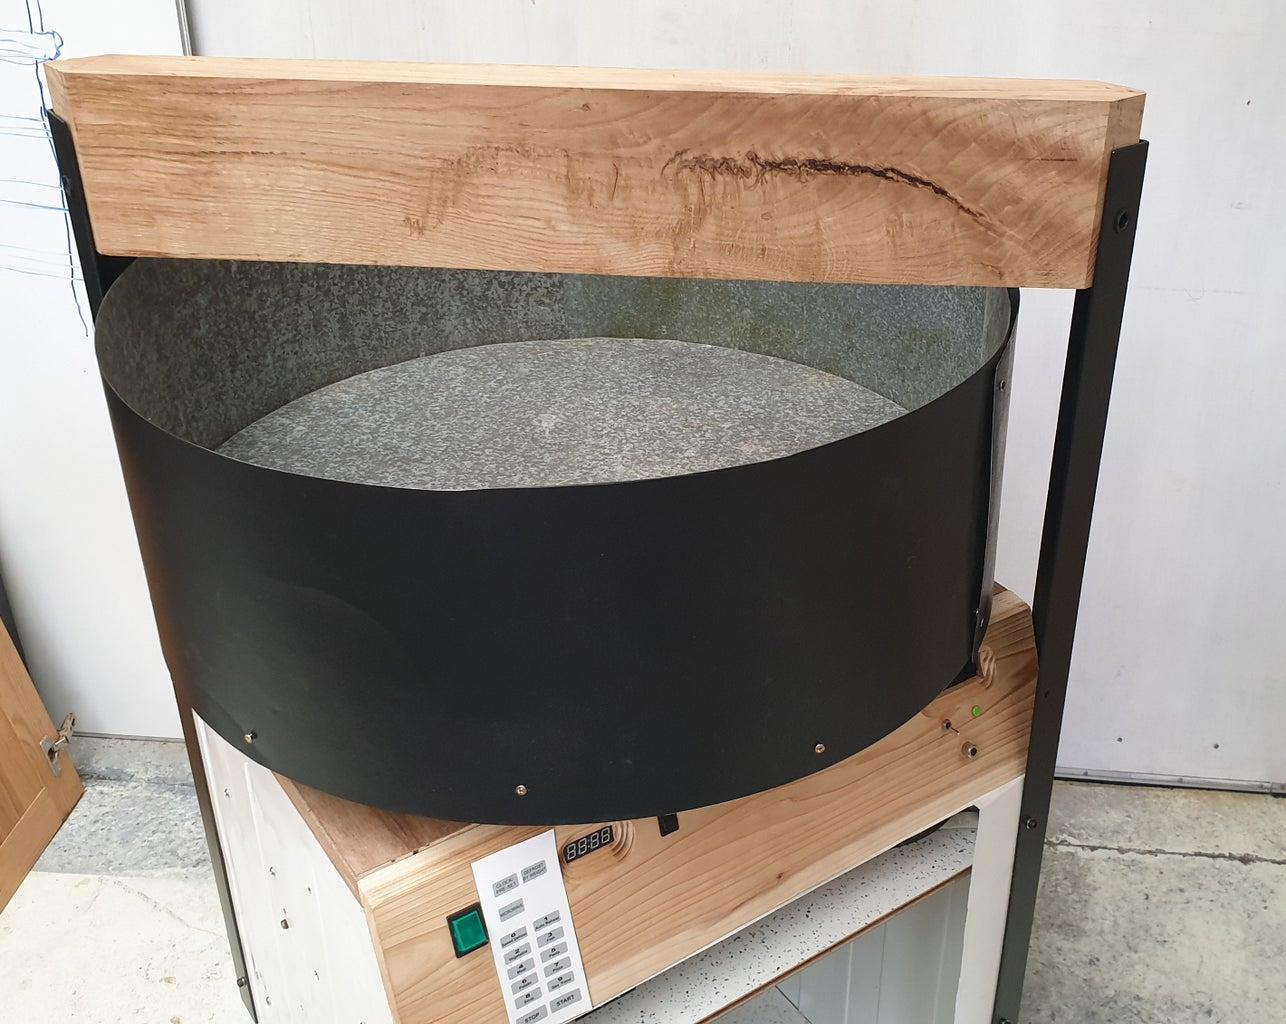 Green Sand Muller #4 - the Over Frame - Assembly